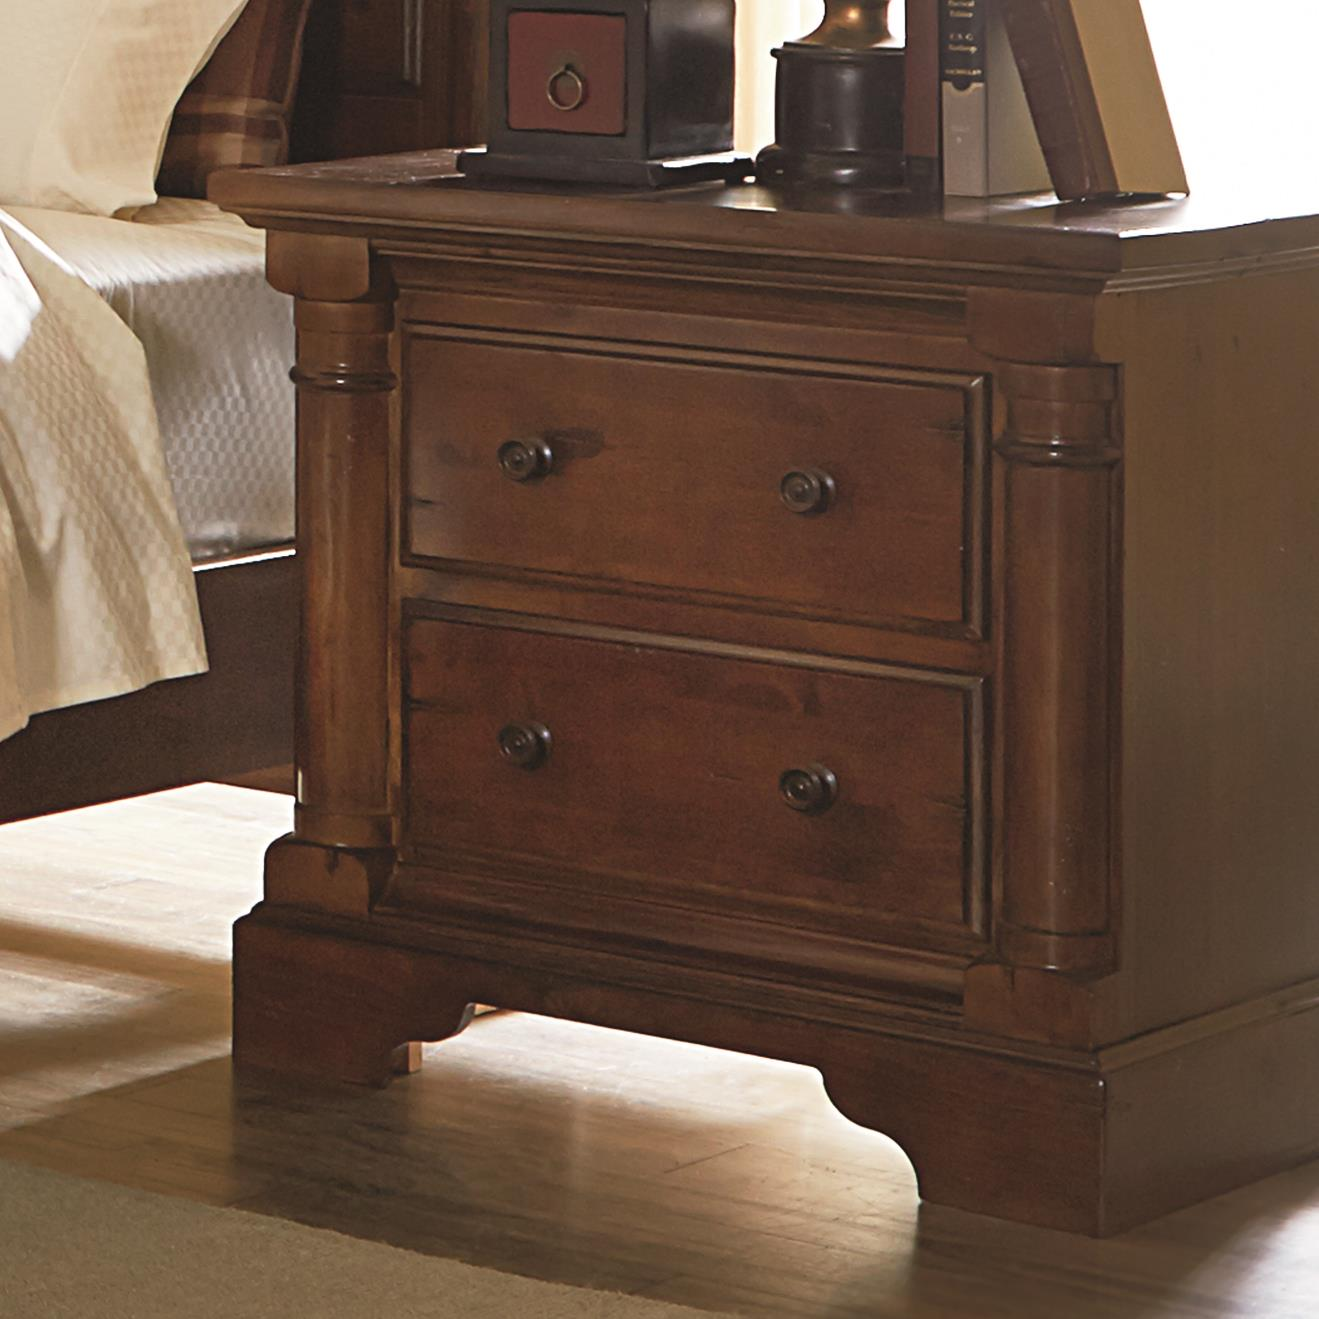 Progressive Furniture Gramercy Park Night Stand - Item Number: P660-43